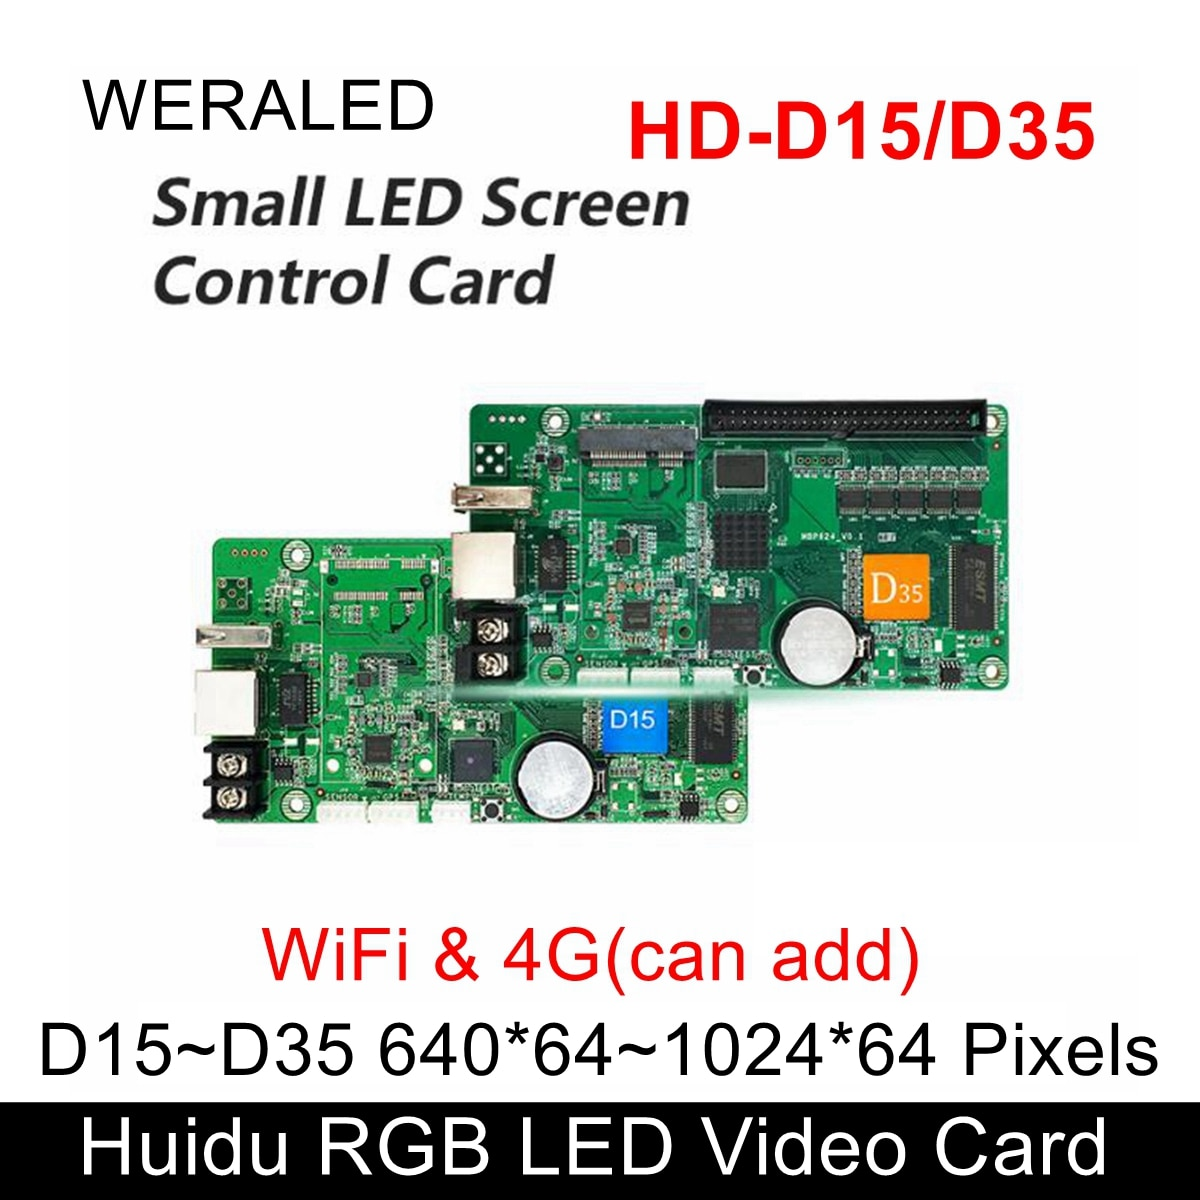 Huidu Asynchronization HD-D35 & HUB75E-5 Full Color LED Video Controller 1024*64 pixels Work with P2.5 P3 P4 P5 P6 P7.62 P8 P10